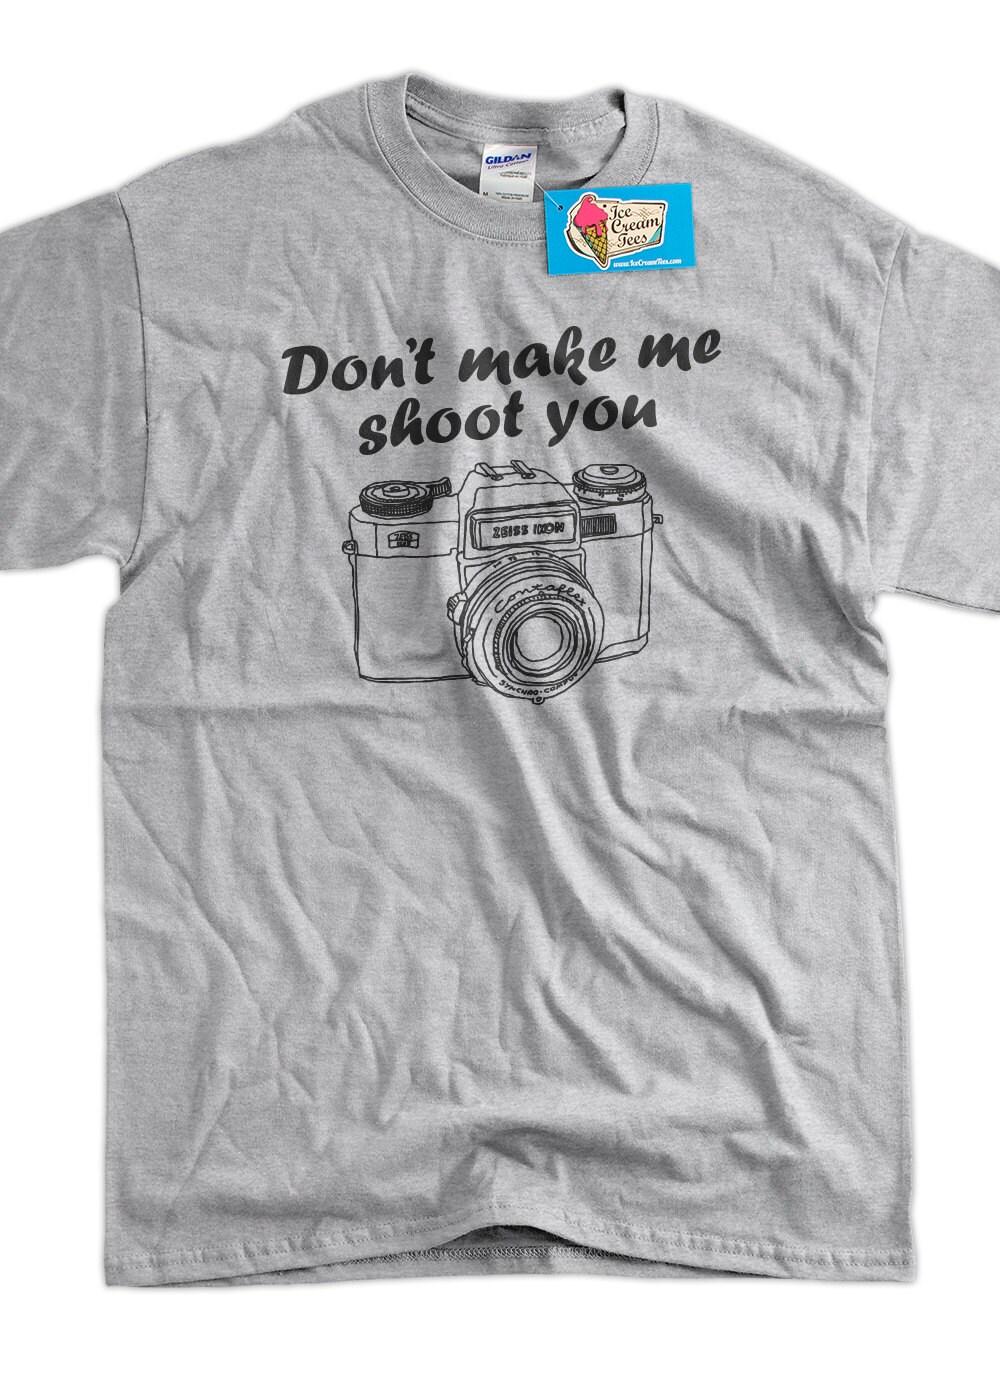 Custom T-Shirts - Design Your Own T-Shirts Online - Free Make photo t shirts